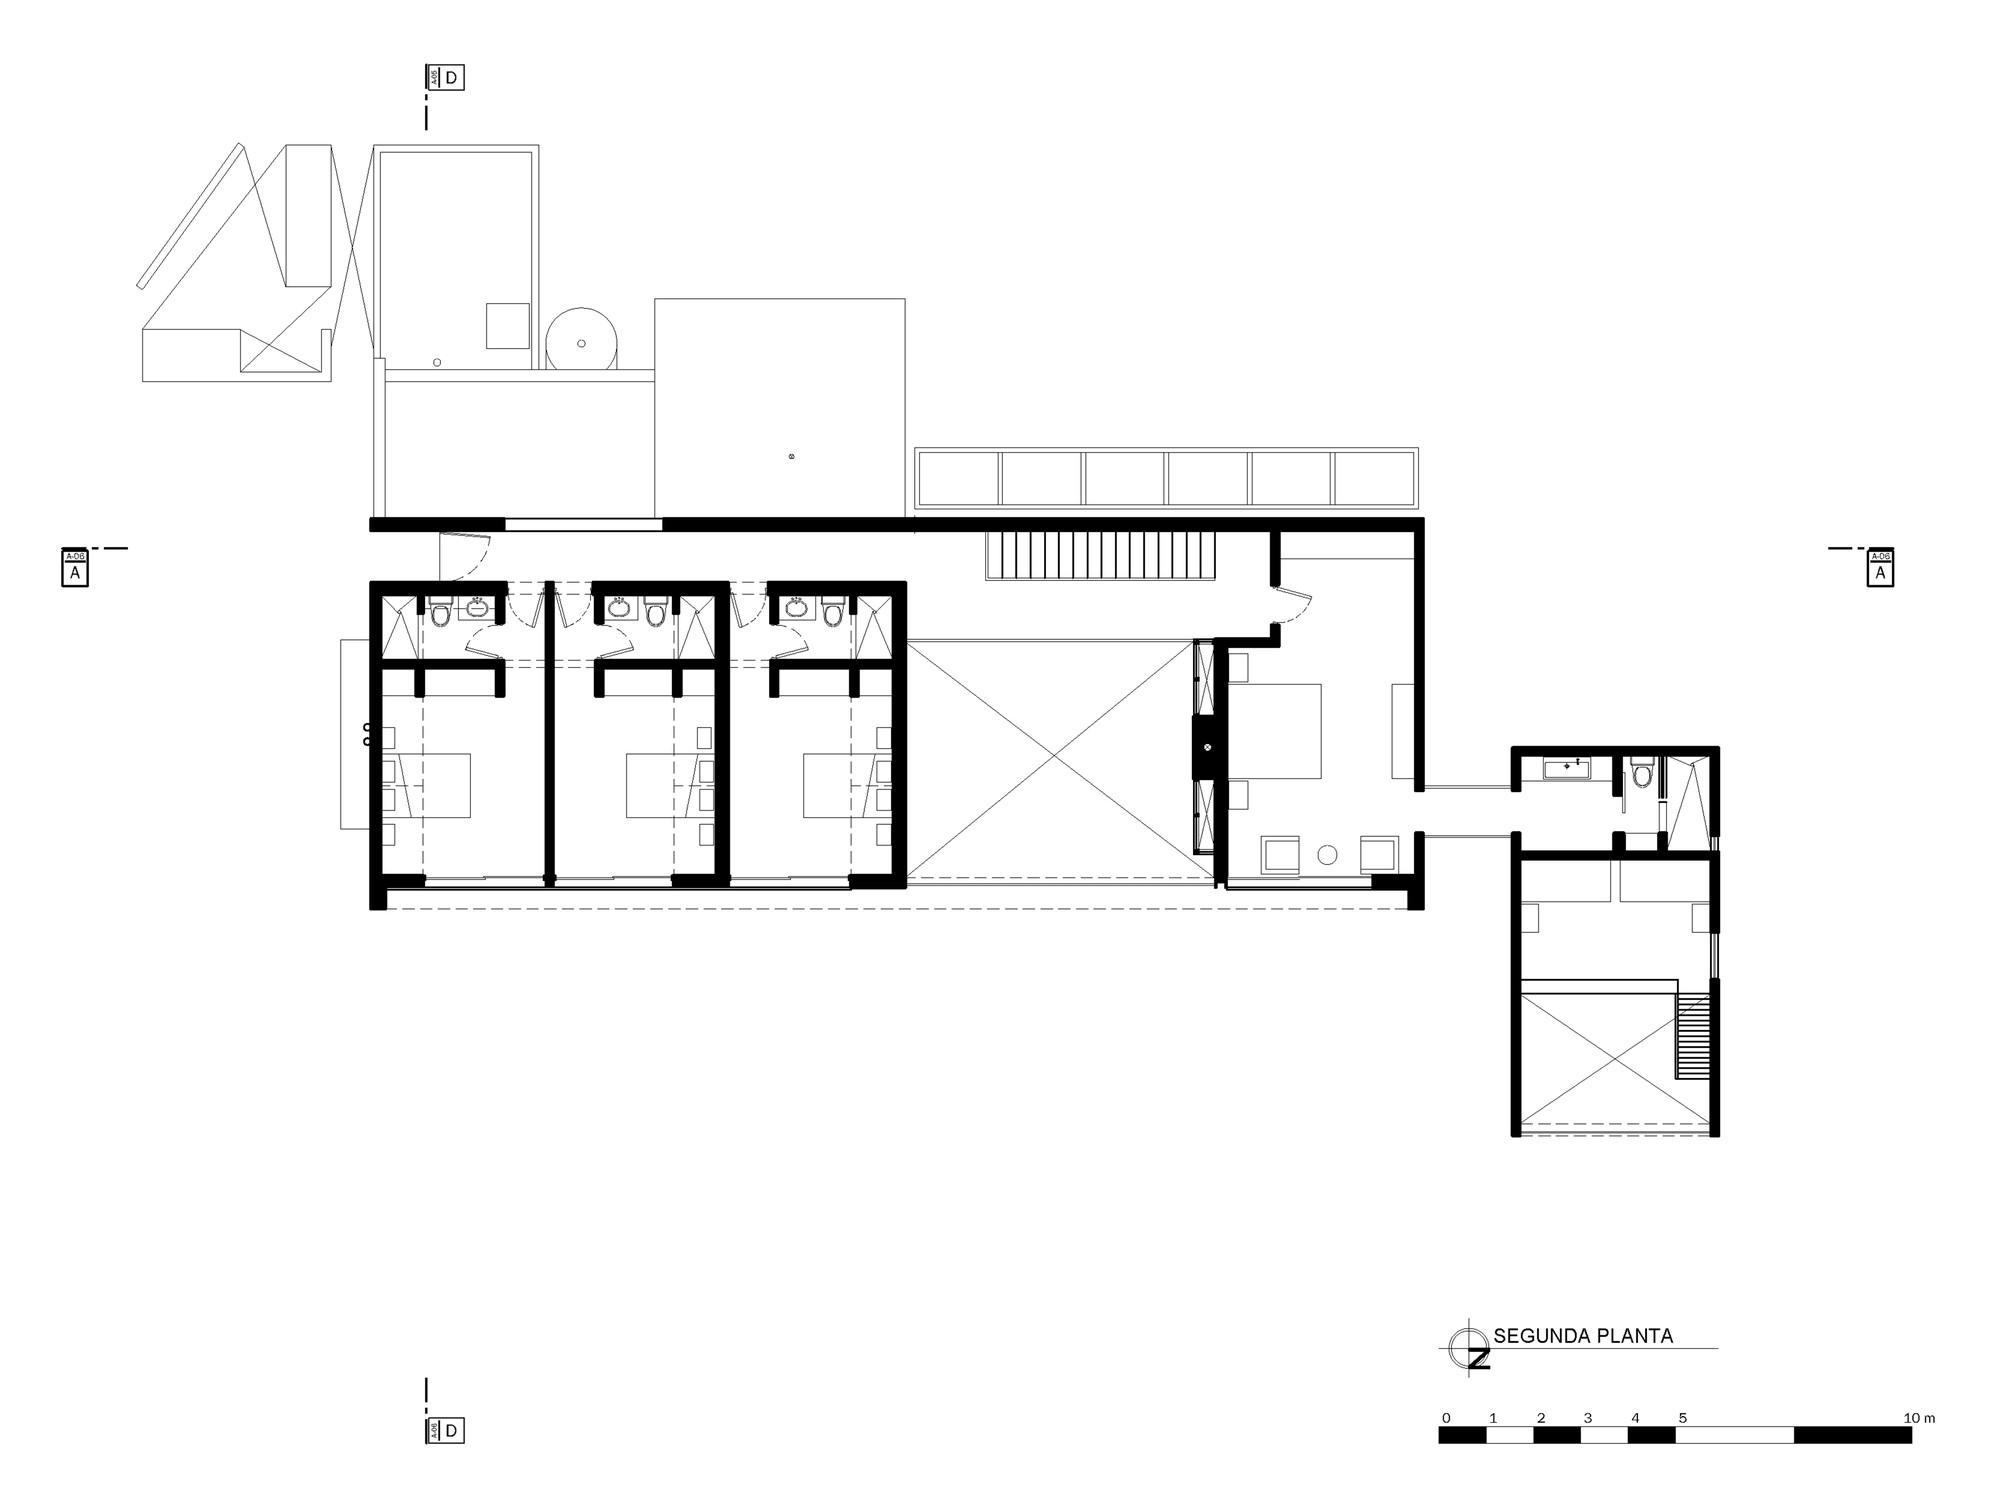 Villa Floor Plans Galeria De Casa B2 Jaime Ortiz De Zevallos 24